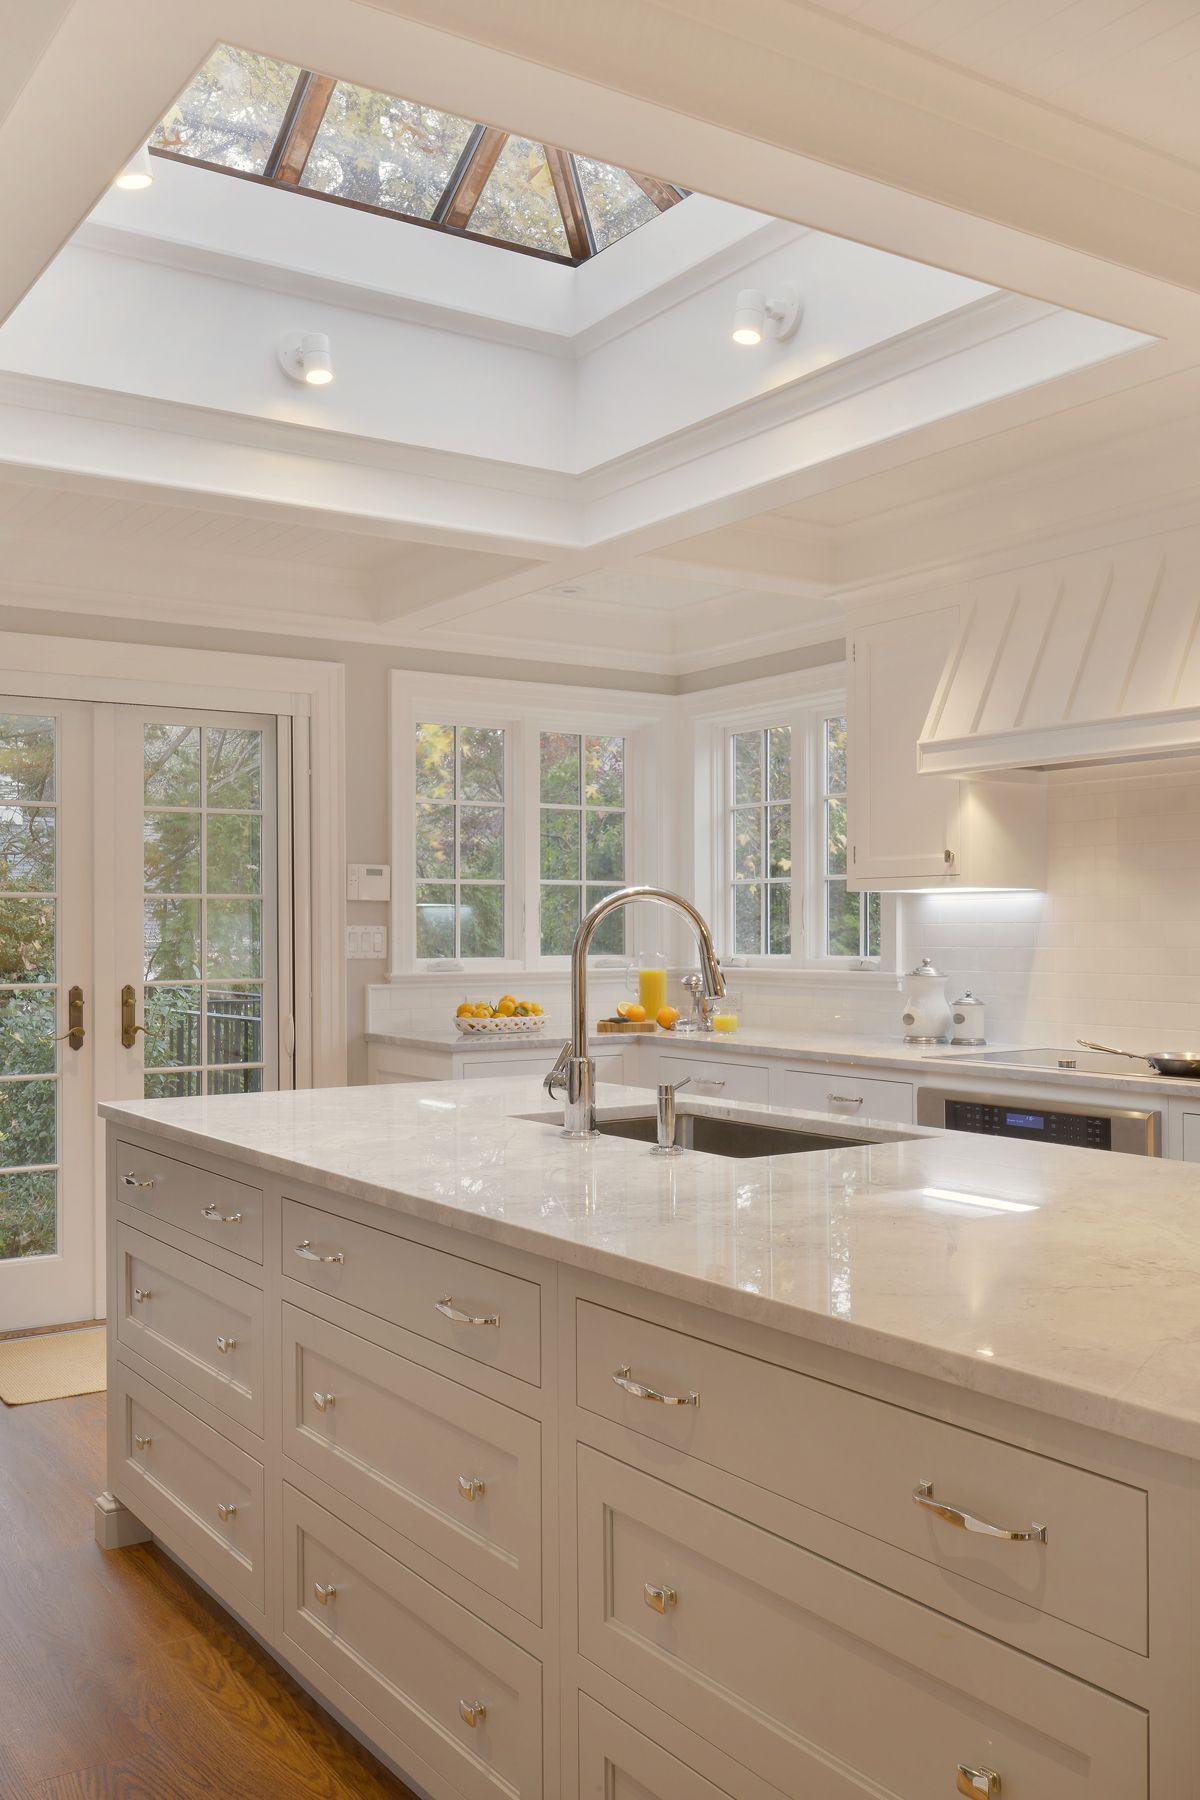 #small kitchen design images #kitchen design gallery photos #open kitchen design #kitchen design luxury #kitchen design tiles #white kitchen design #open kitchen design #kitchen design centres